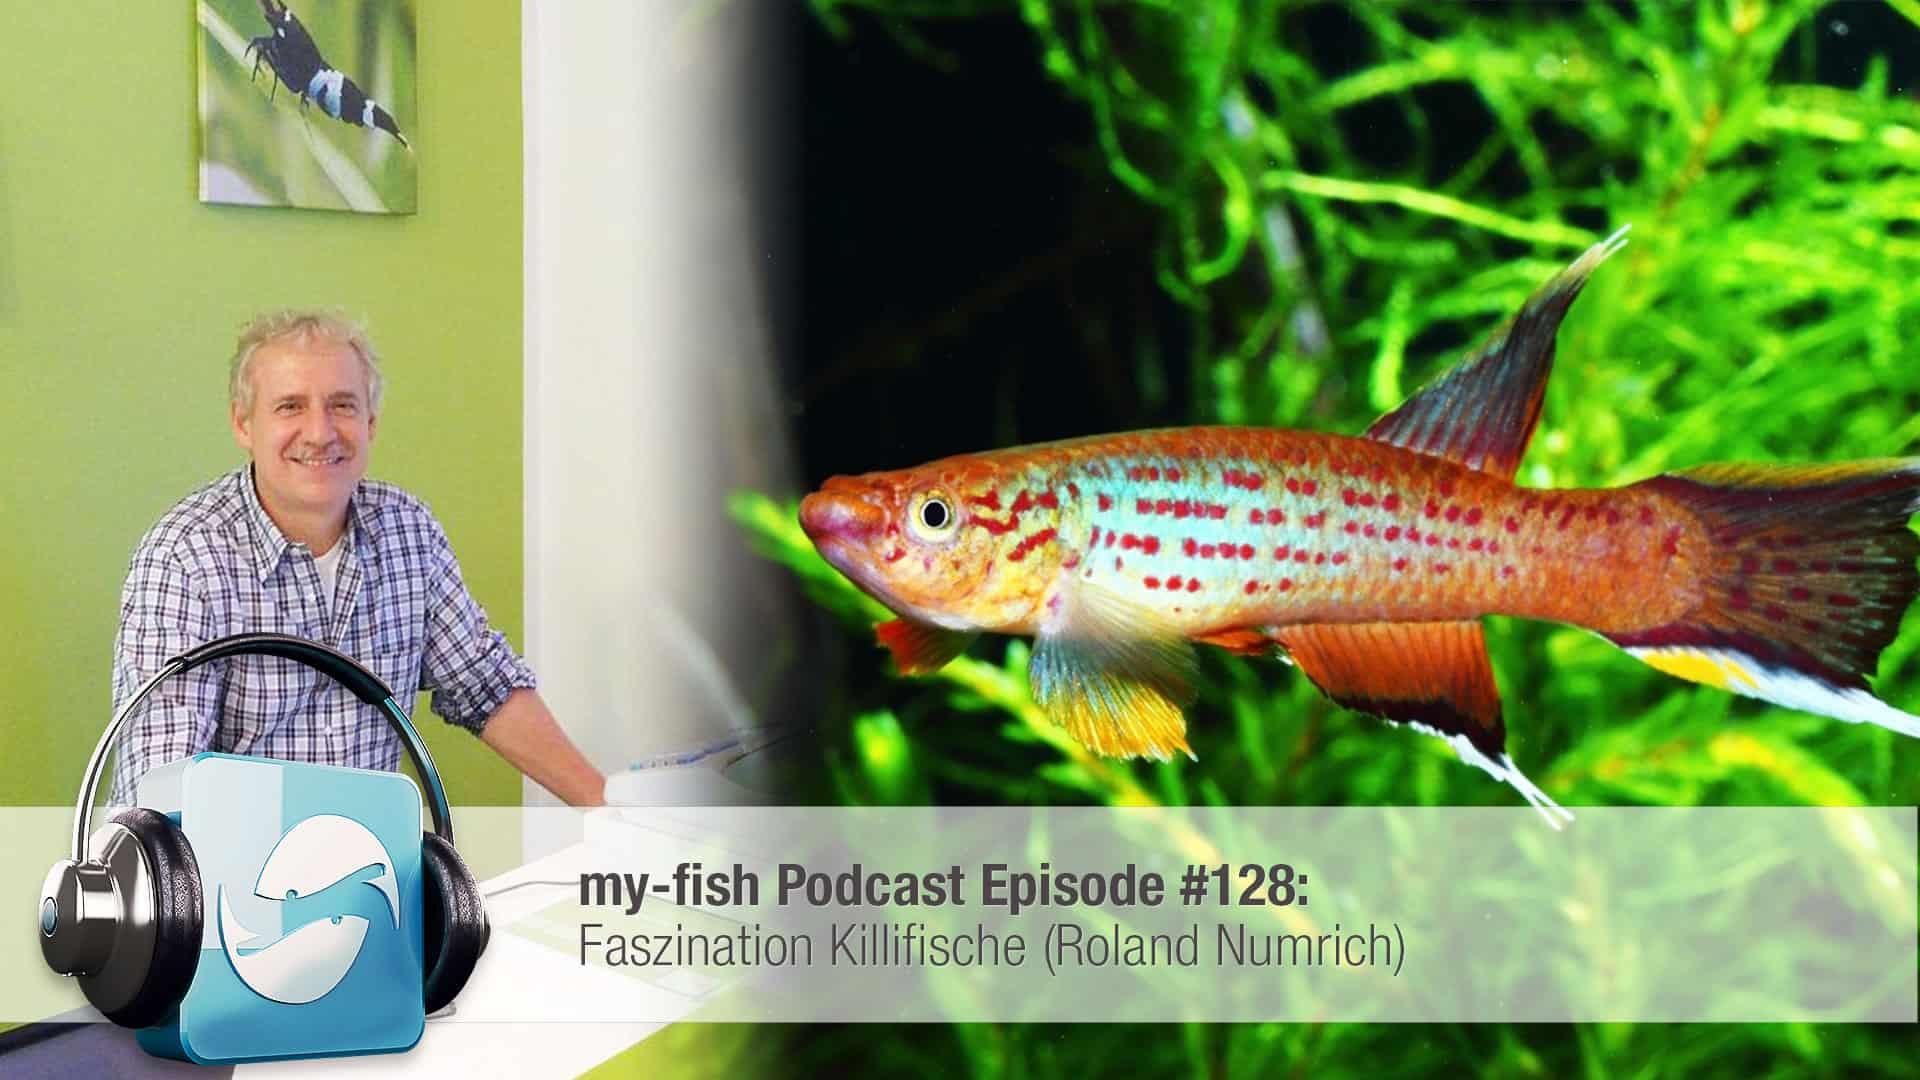 Podcast Episode #128: Faszination Killifische (Roland Numrich) 1